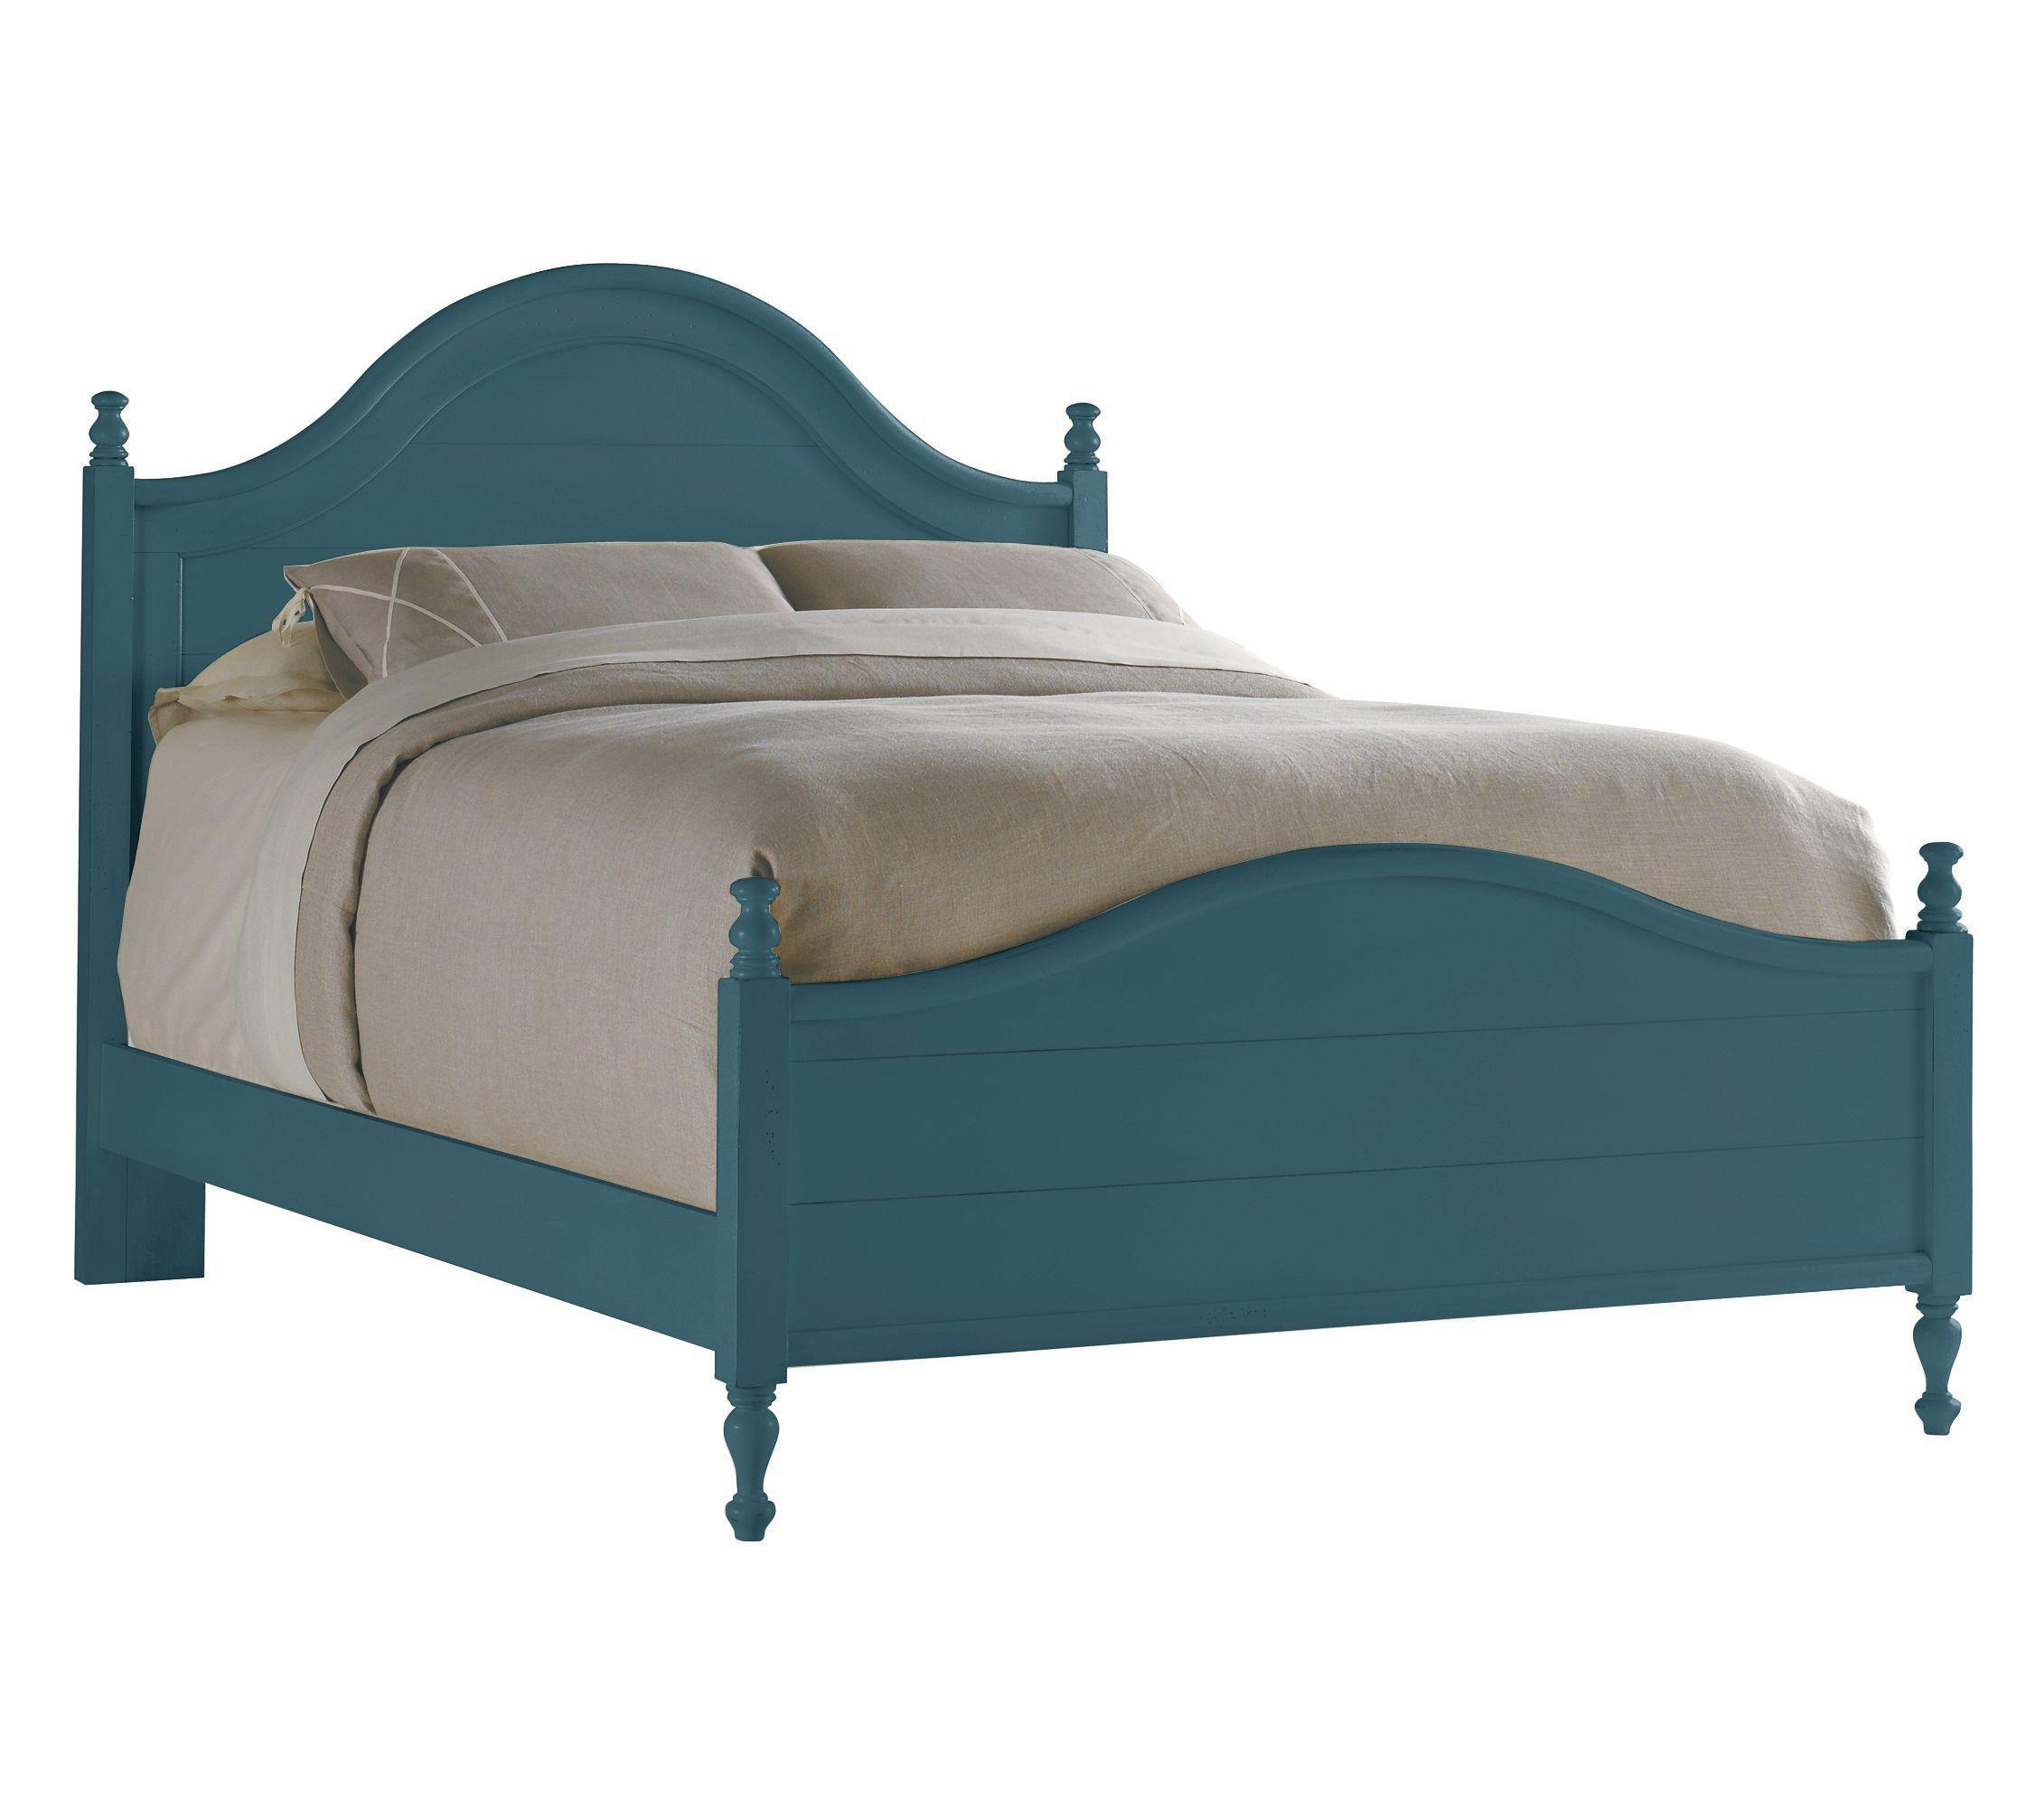 Stanley Furniture Coastal Living Retreat California King Bungalow Bed - Item Number: 411-53-38